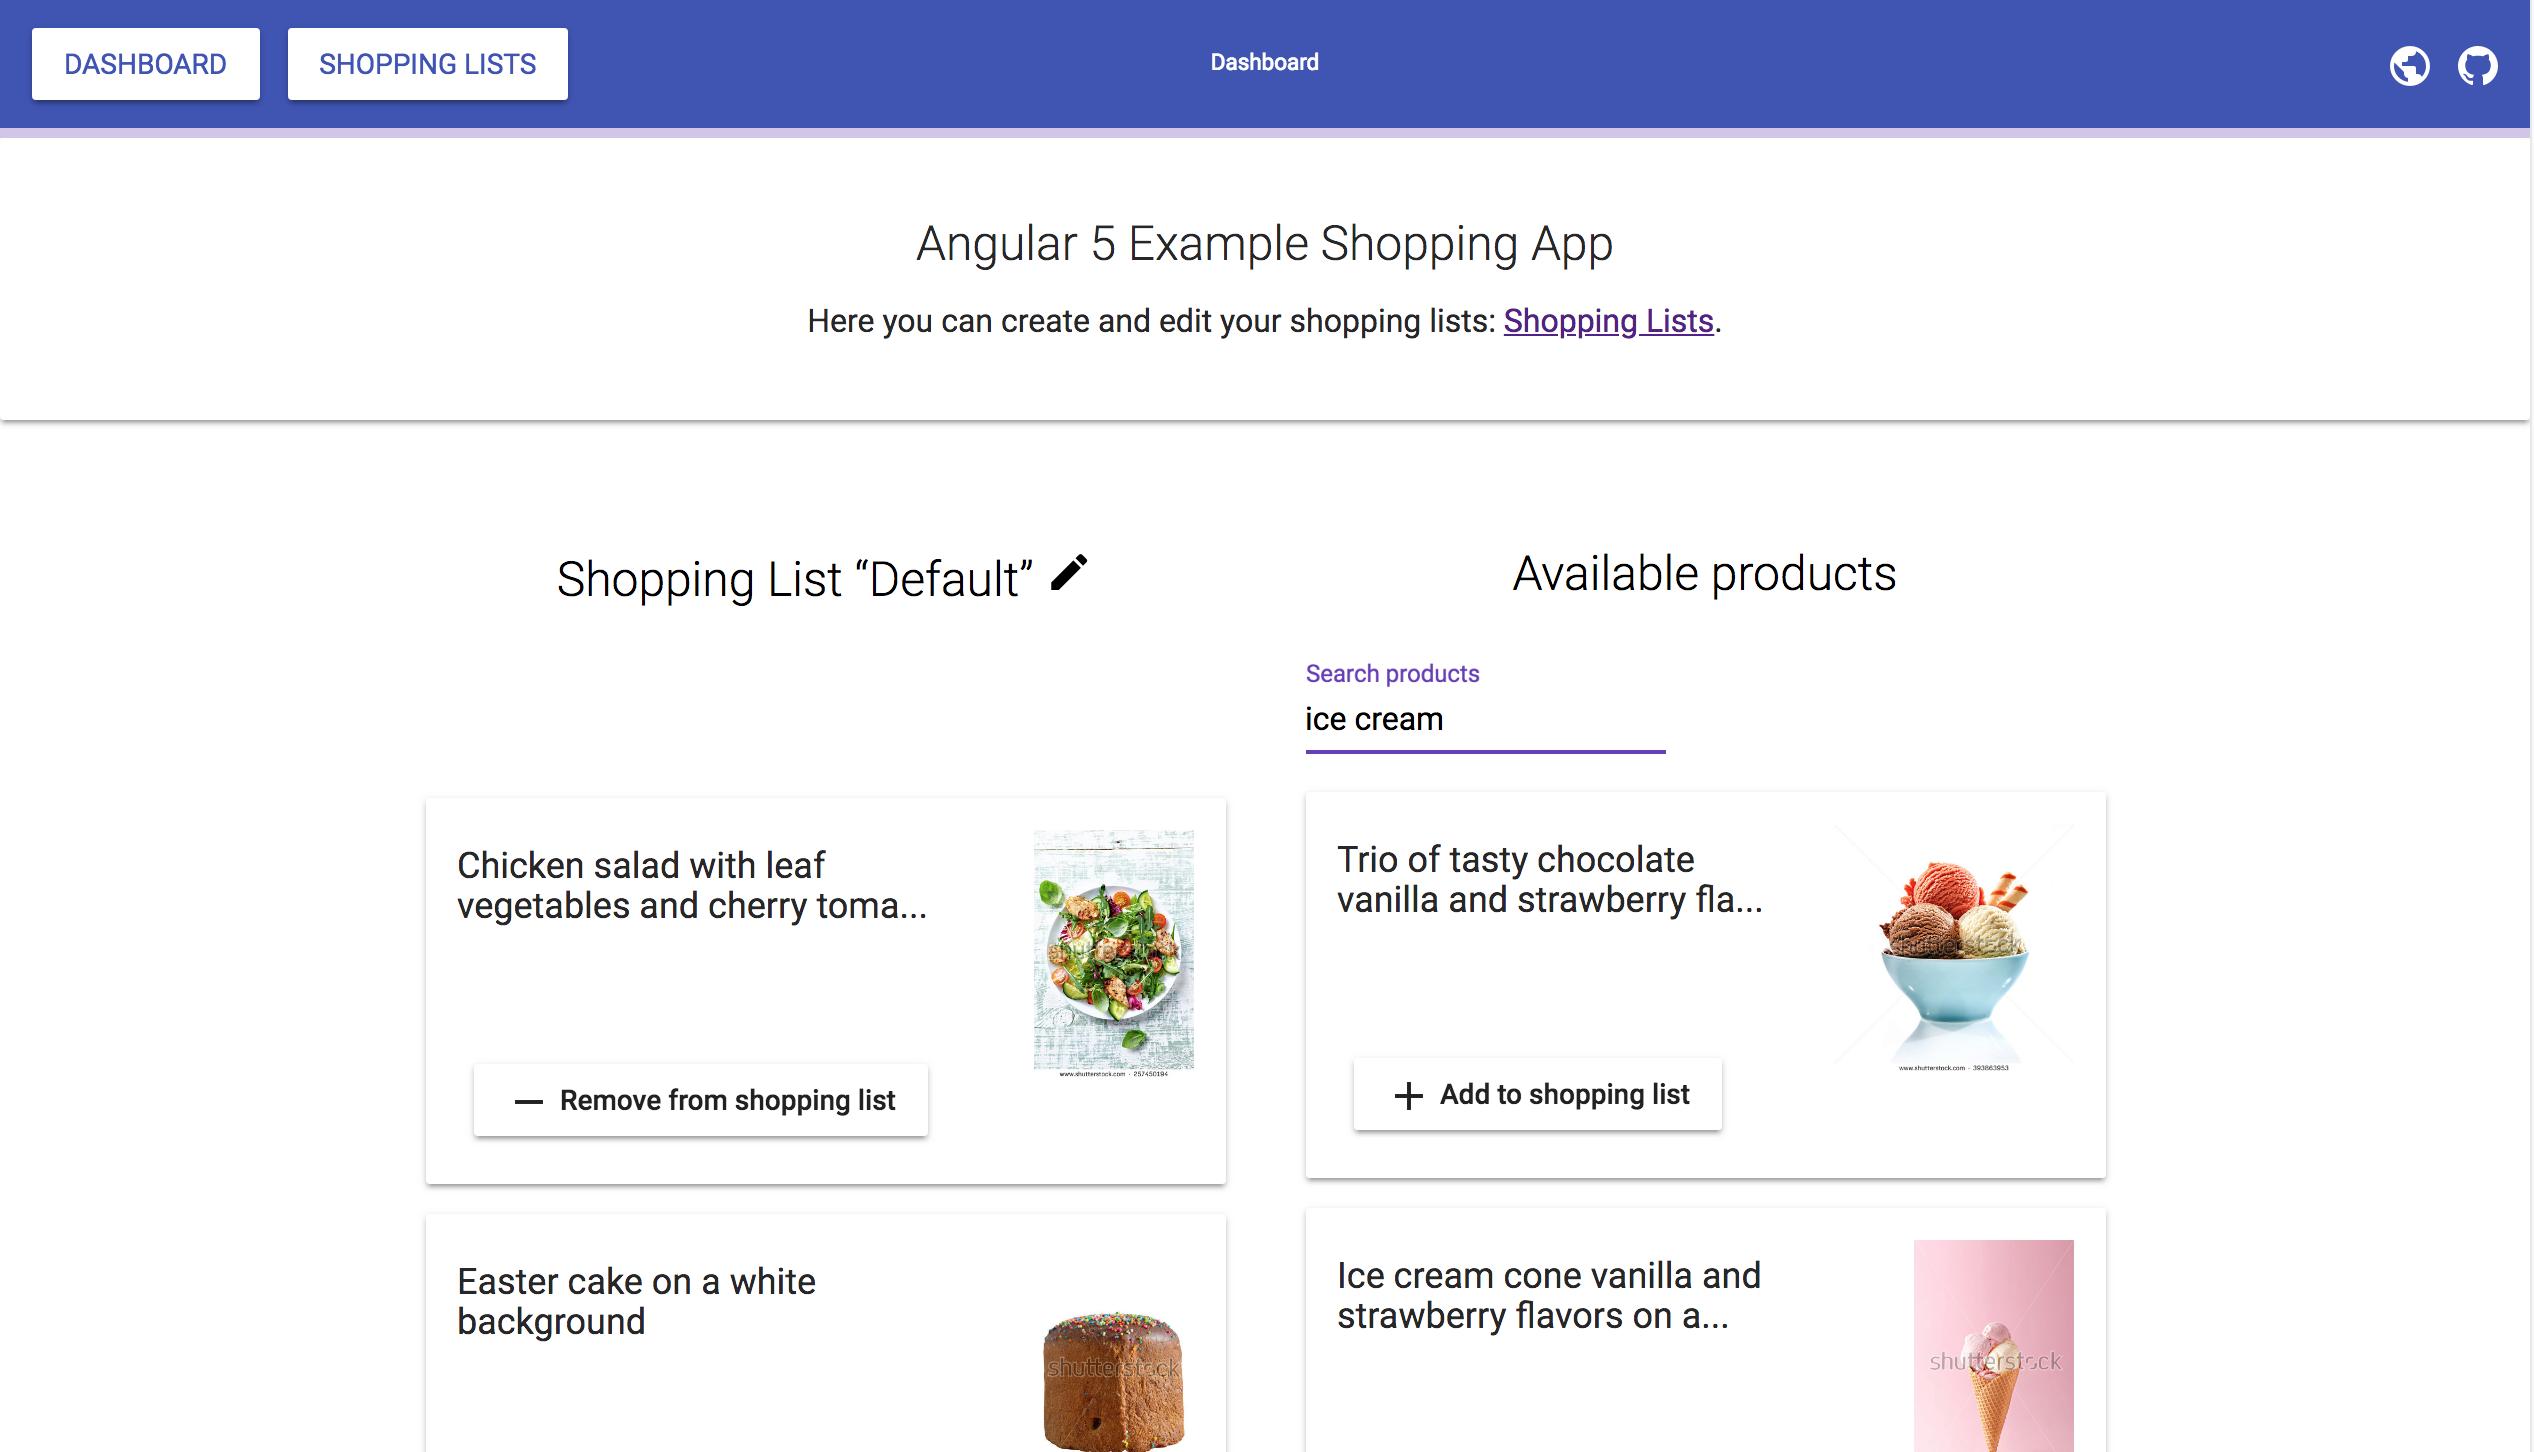 GitHub - affilnost/angular5-example-shopping-app: Angular 5